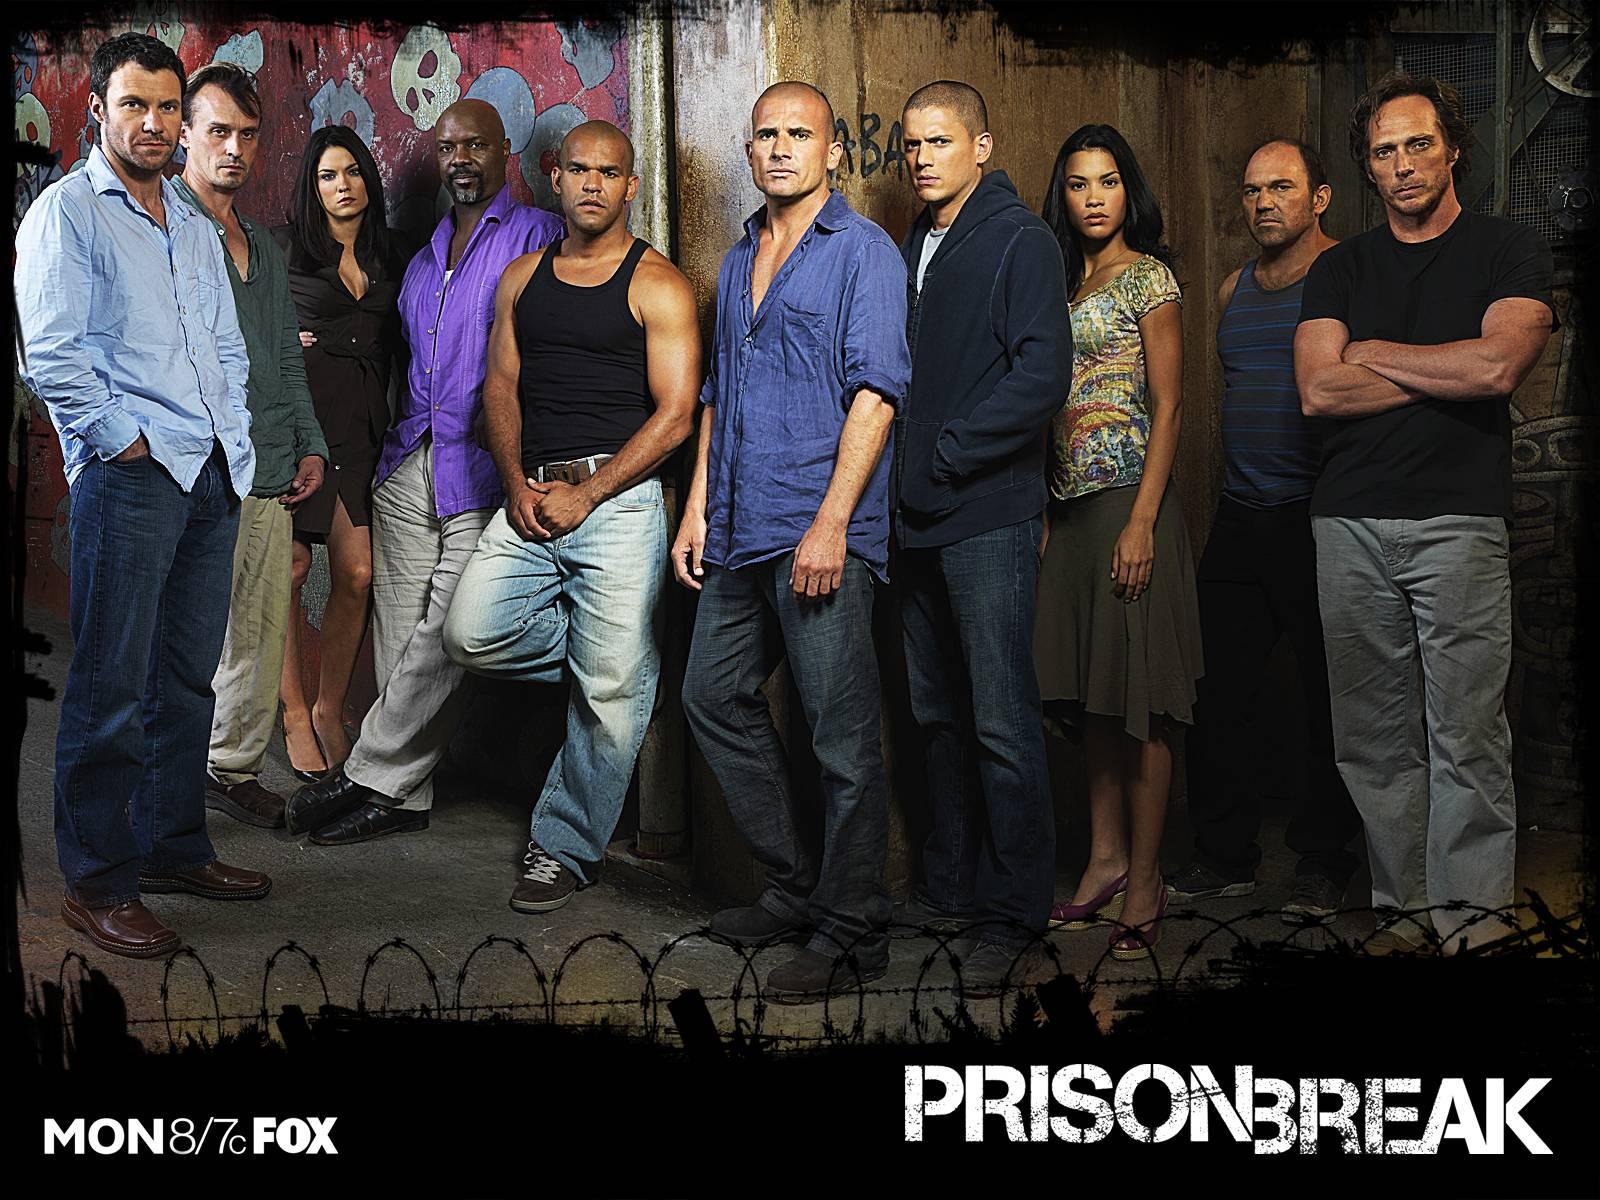 Prison Break Season 4 Wallpapers Wallpaper Cave